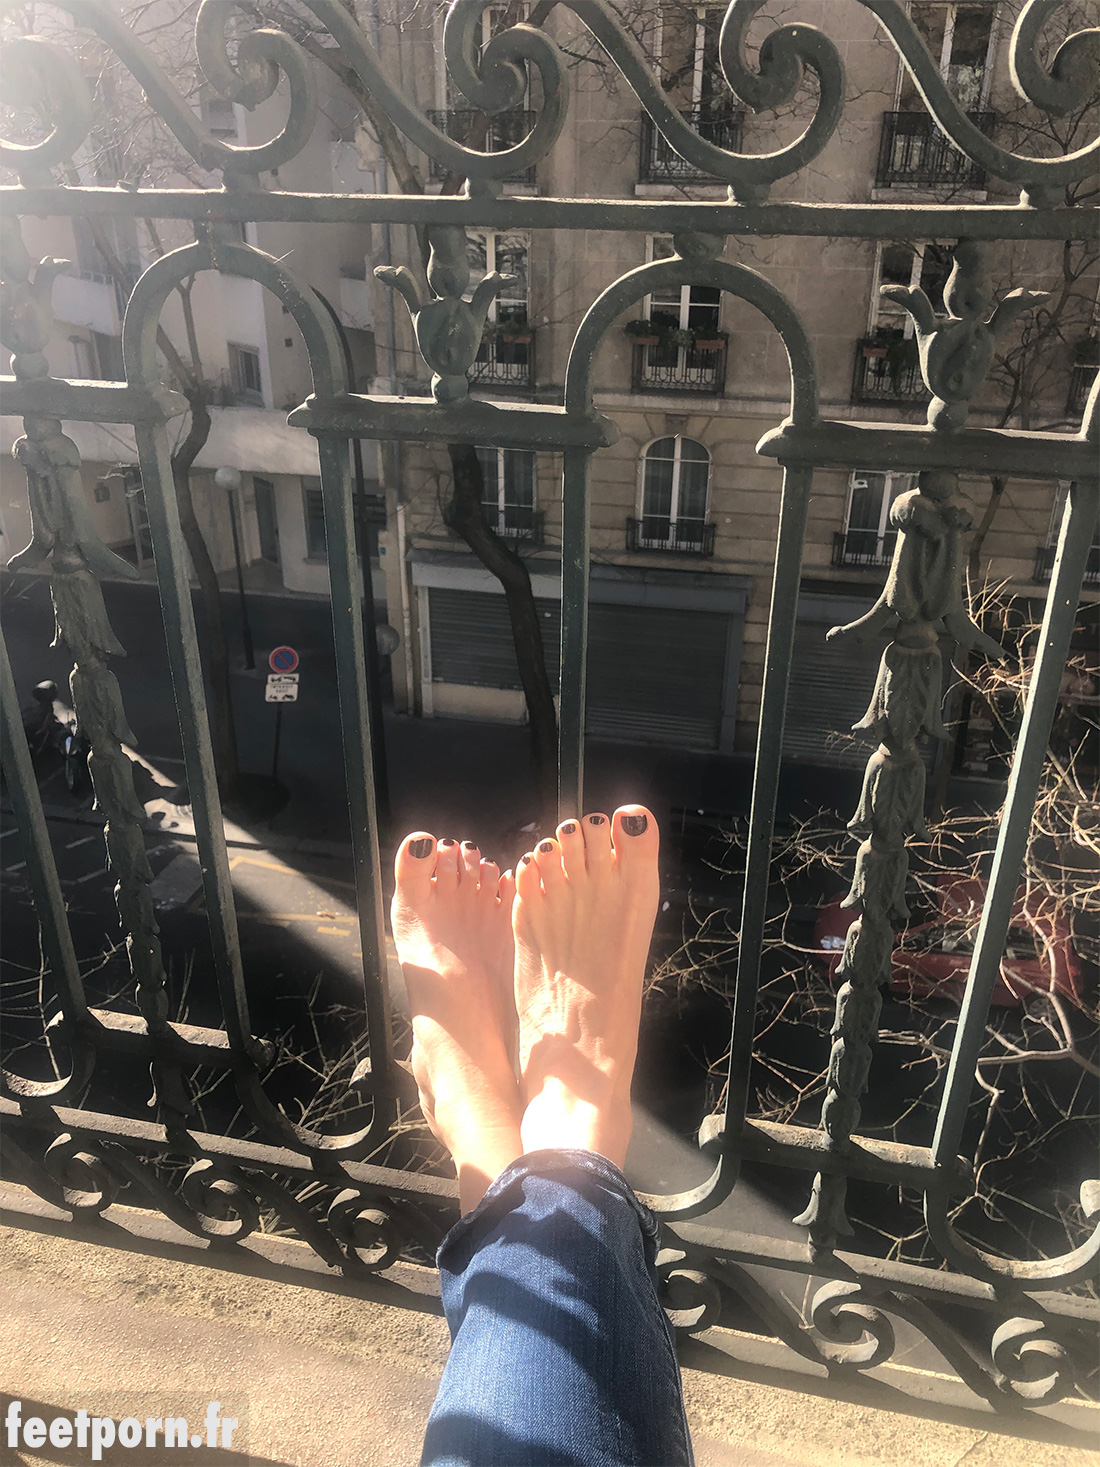 My girlfriend's feet on the balcony